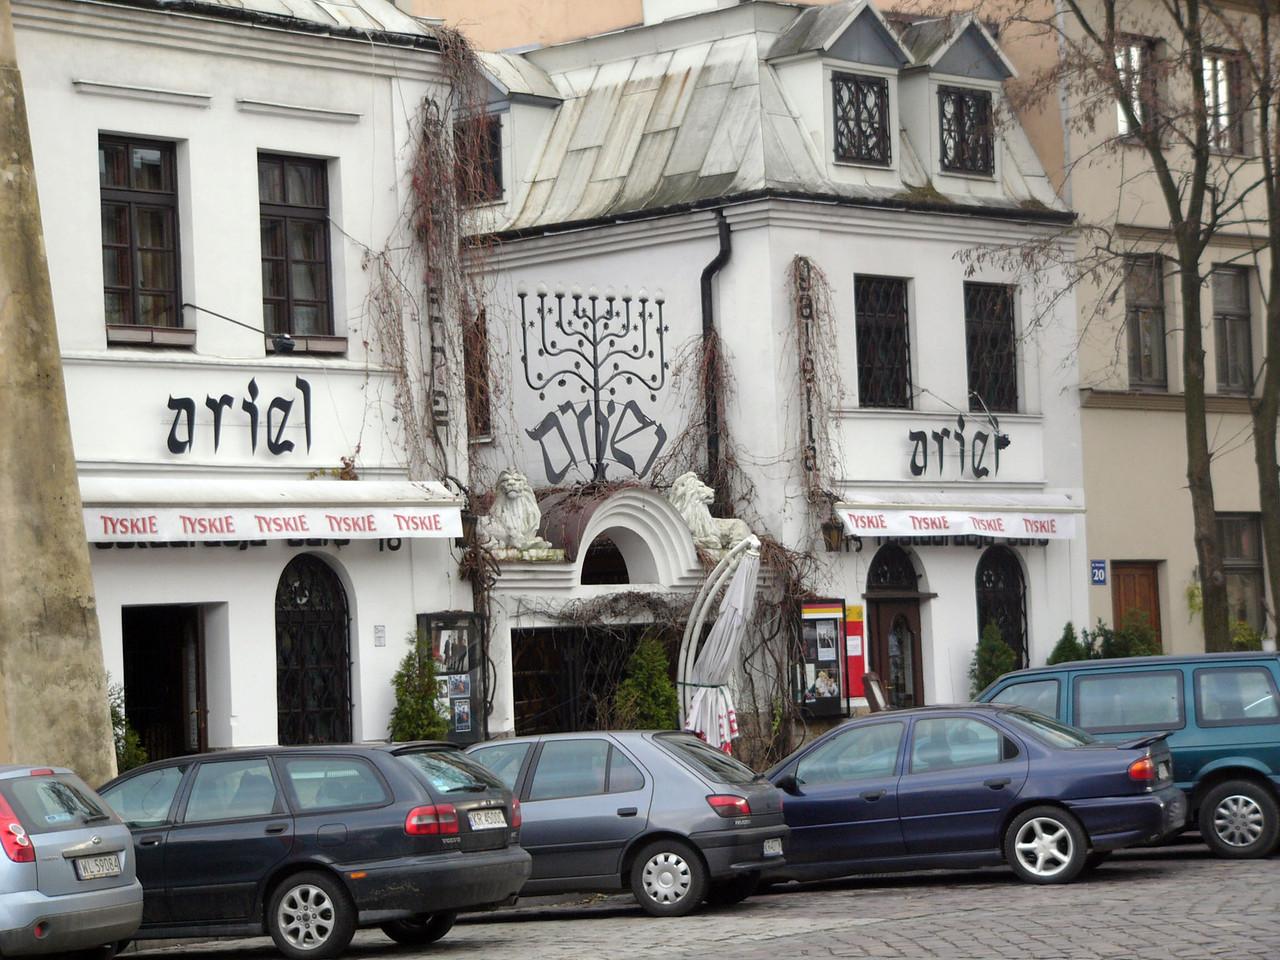 Jewish themed restaurant in historical Jewish area